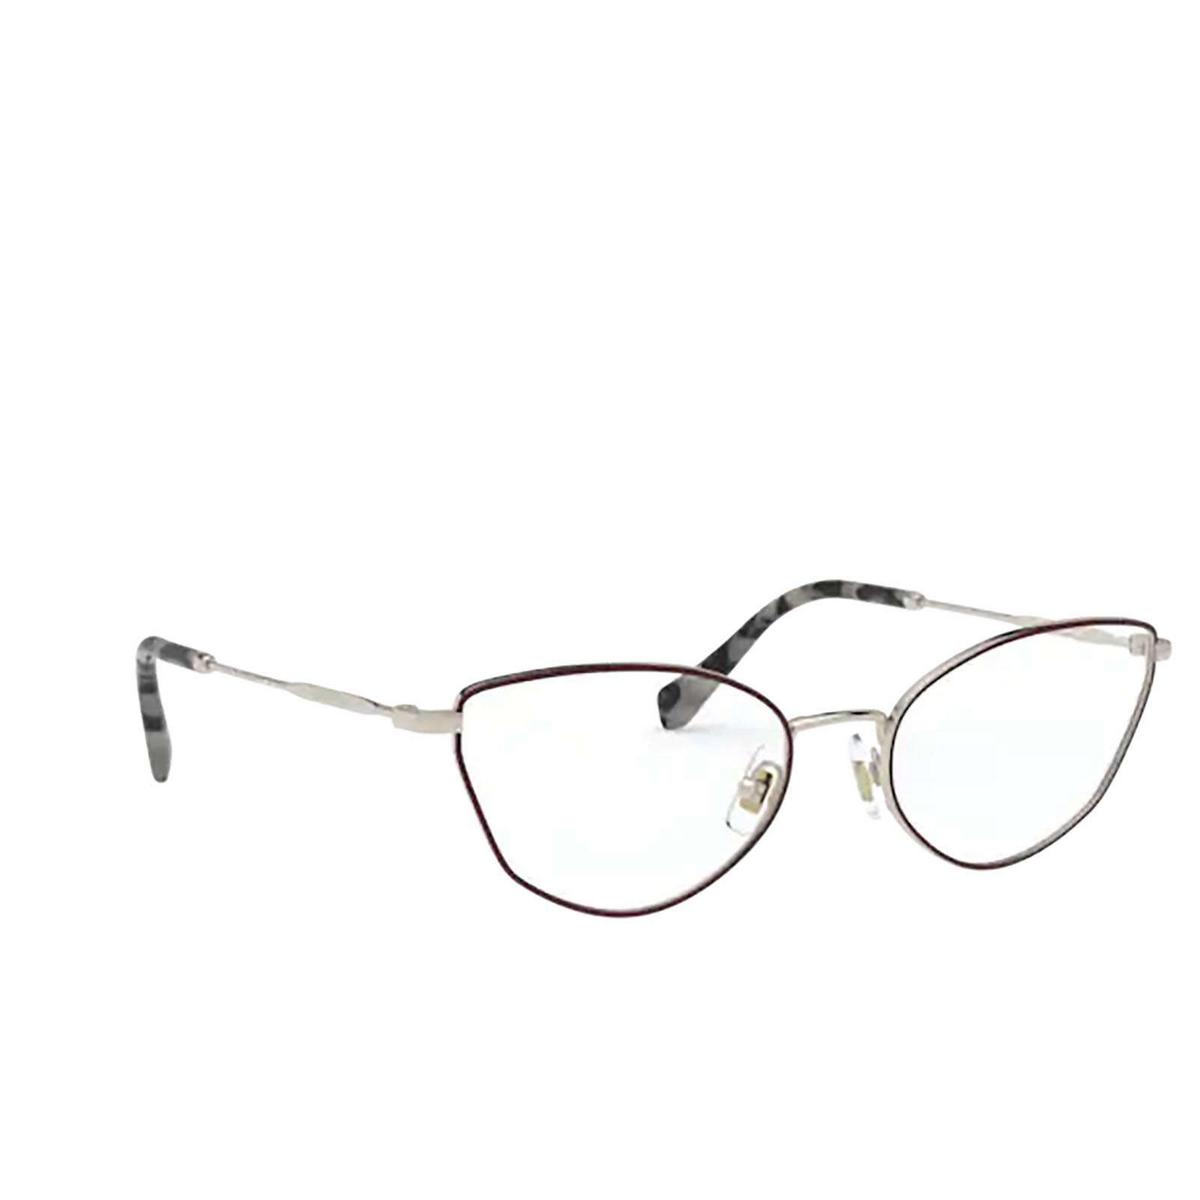 Miu Miu® Cat-eye Eyeglasses: MU 51SV color Pale Gold / Bordeaux 09B1O1 - three-quarters view.